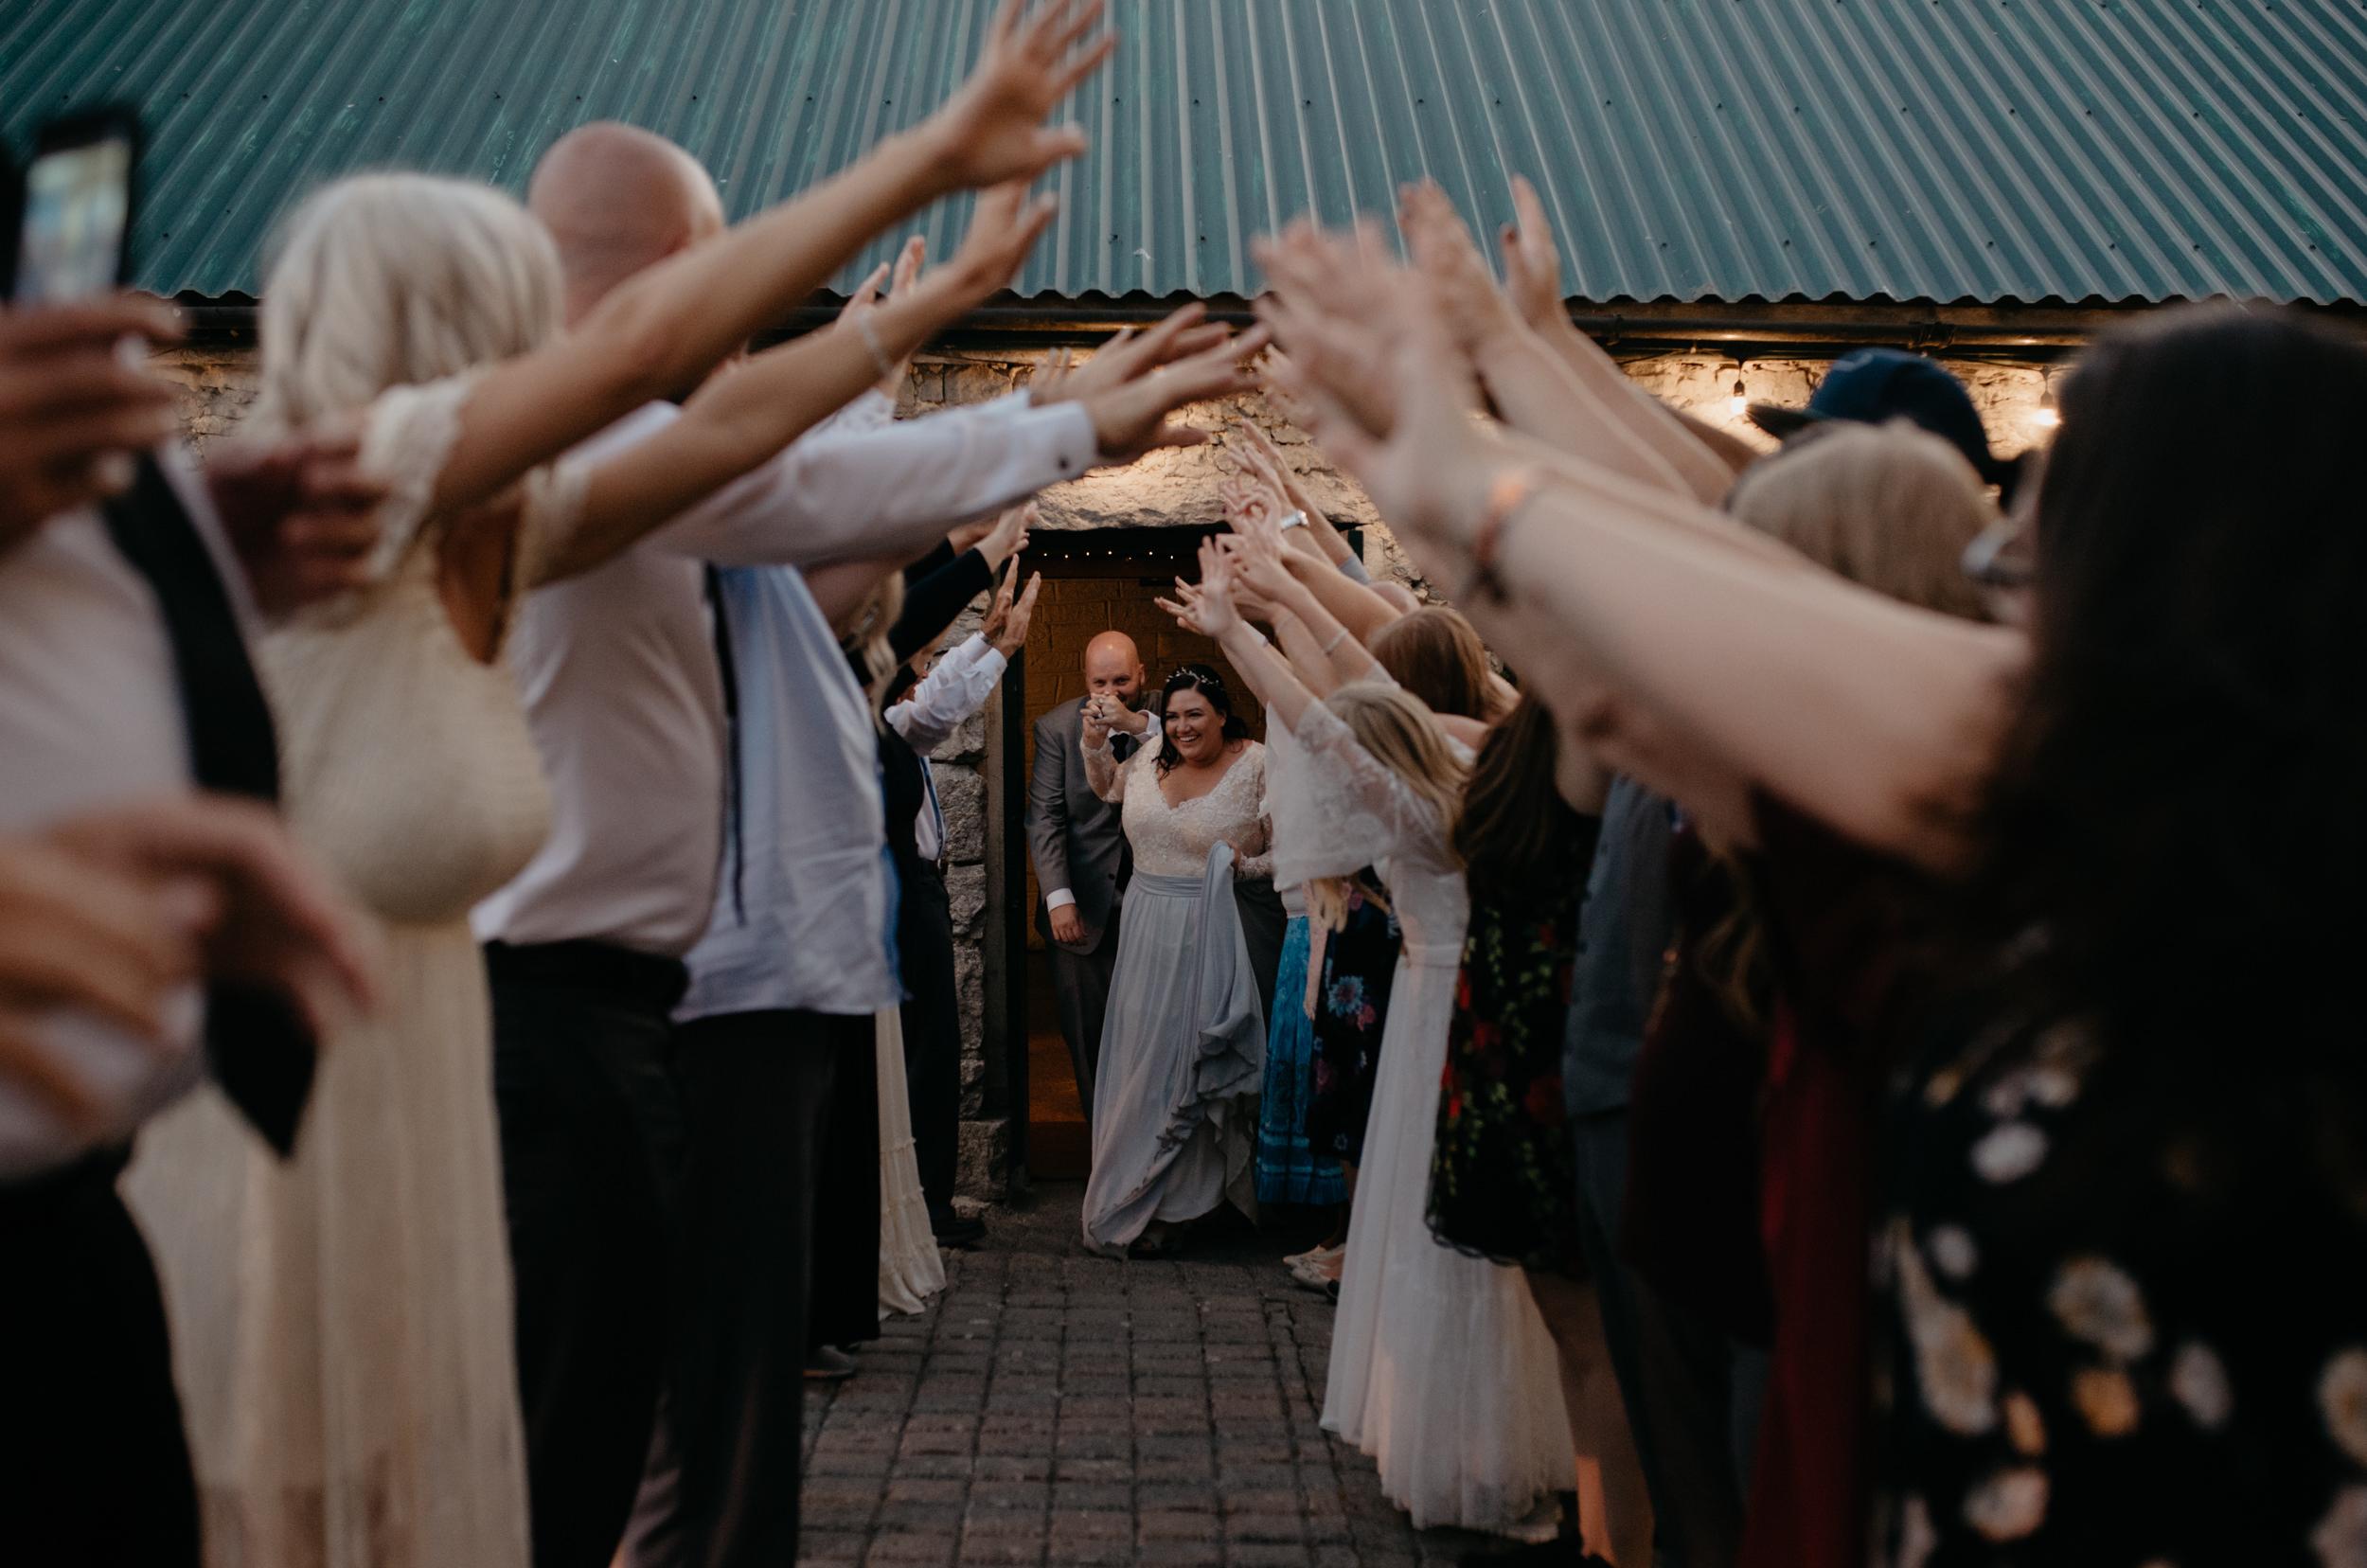 Grand exit at Ireland destination wedding. County Clare, Ireland wedding and elopement photographer.